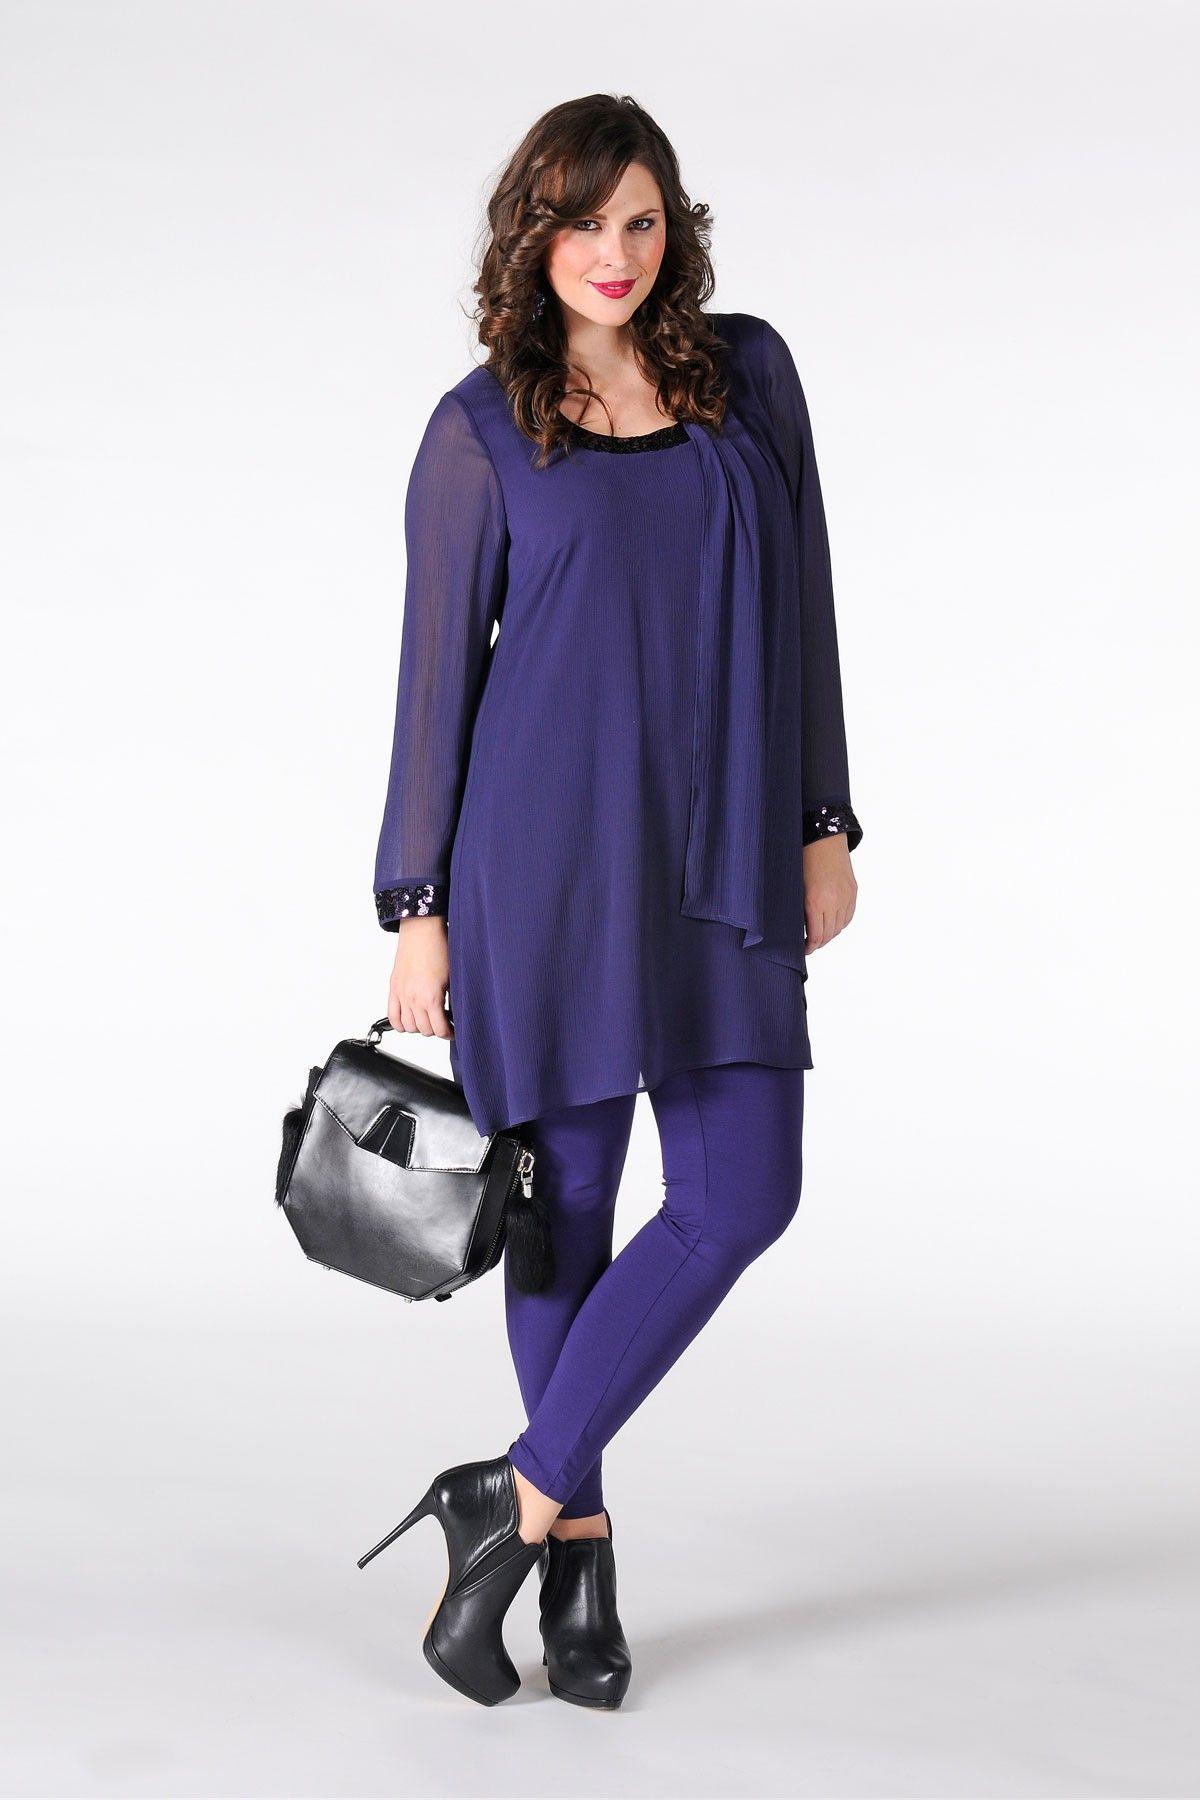 Tunic A-sym paillet VOILE - Yoek Plus size fashion grote maten mode winter 13/14